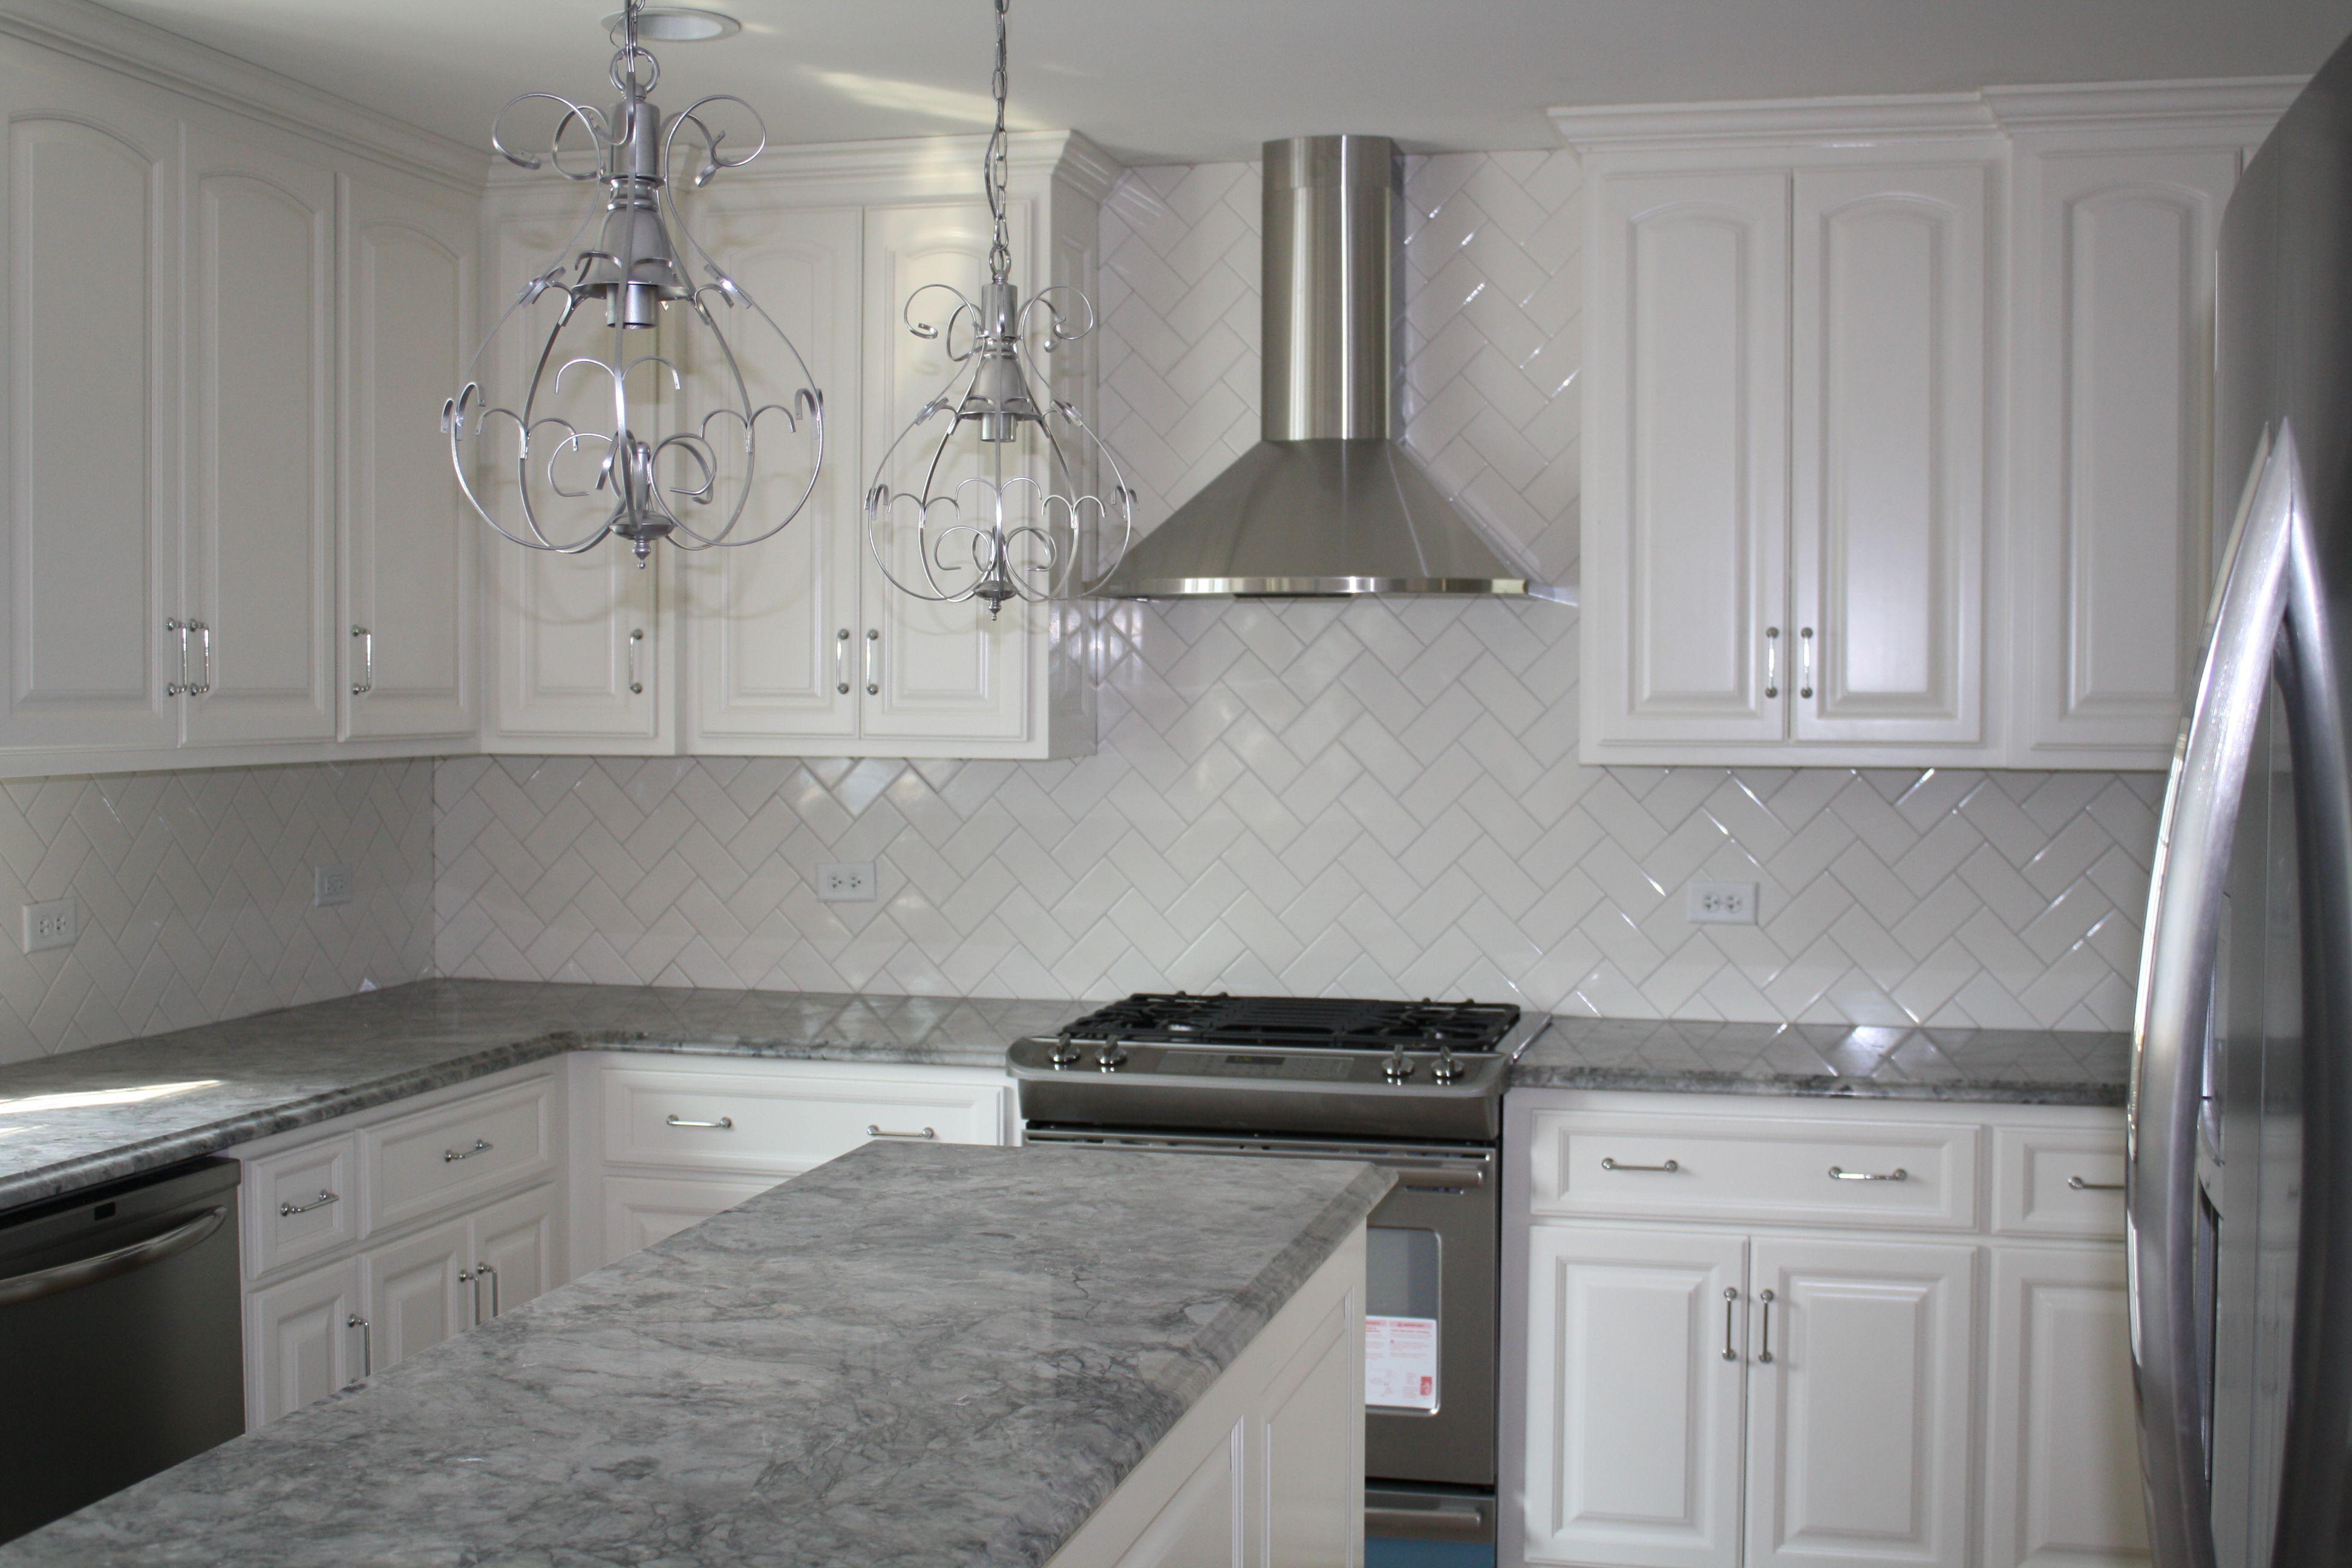 light grey granite countertop light gray kitchen cabinets light grey granite countertop 17 Best images about kitchen counters on Pinterest Countertops Slate backsplash and Cabinets